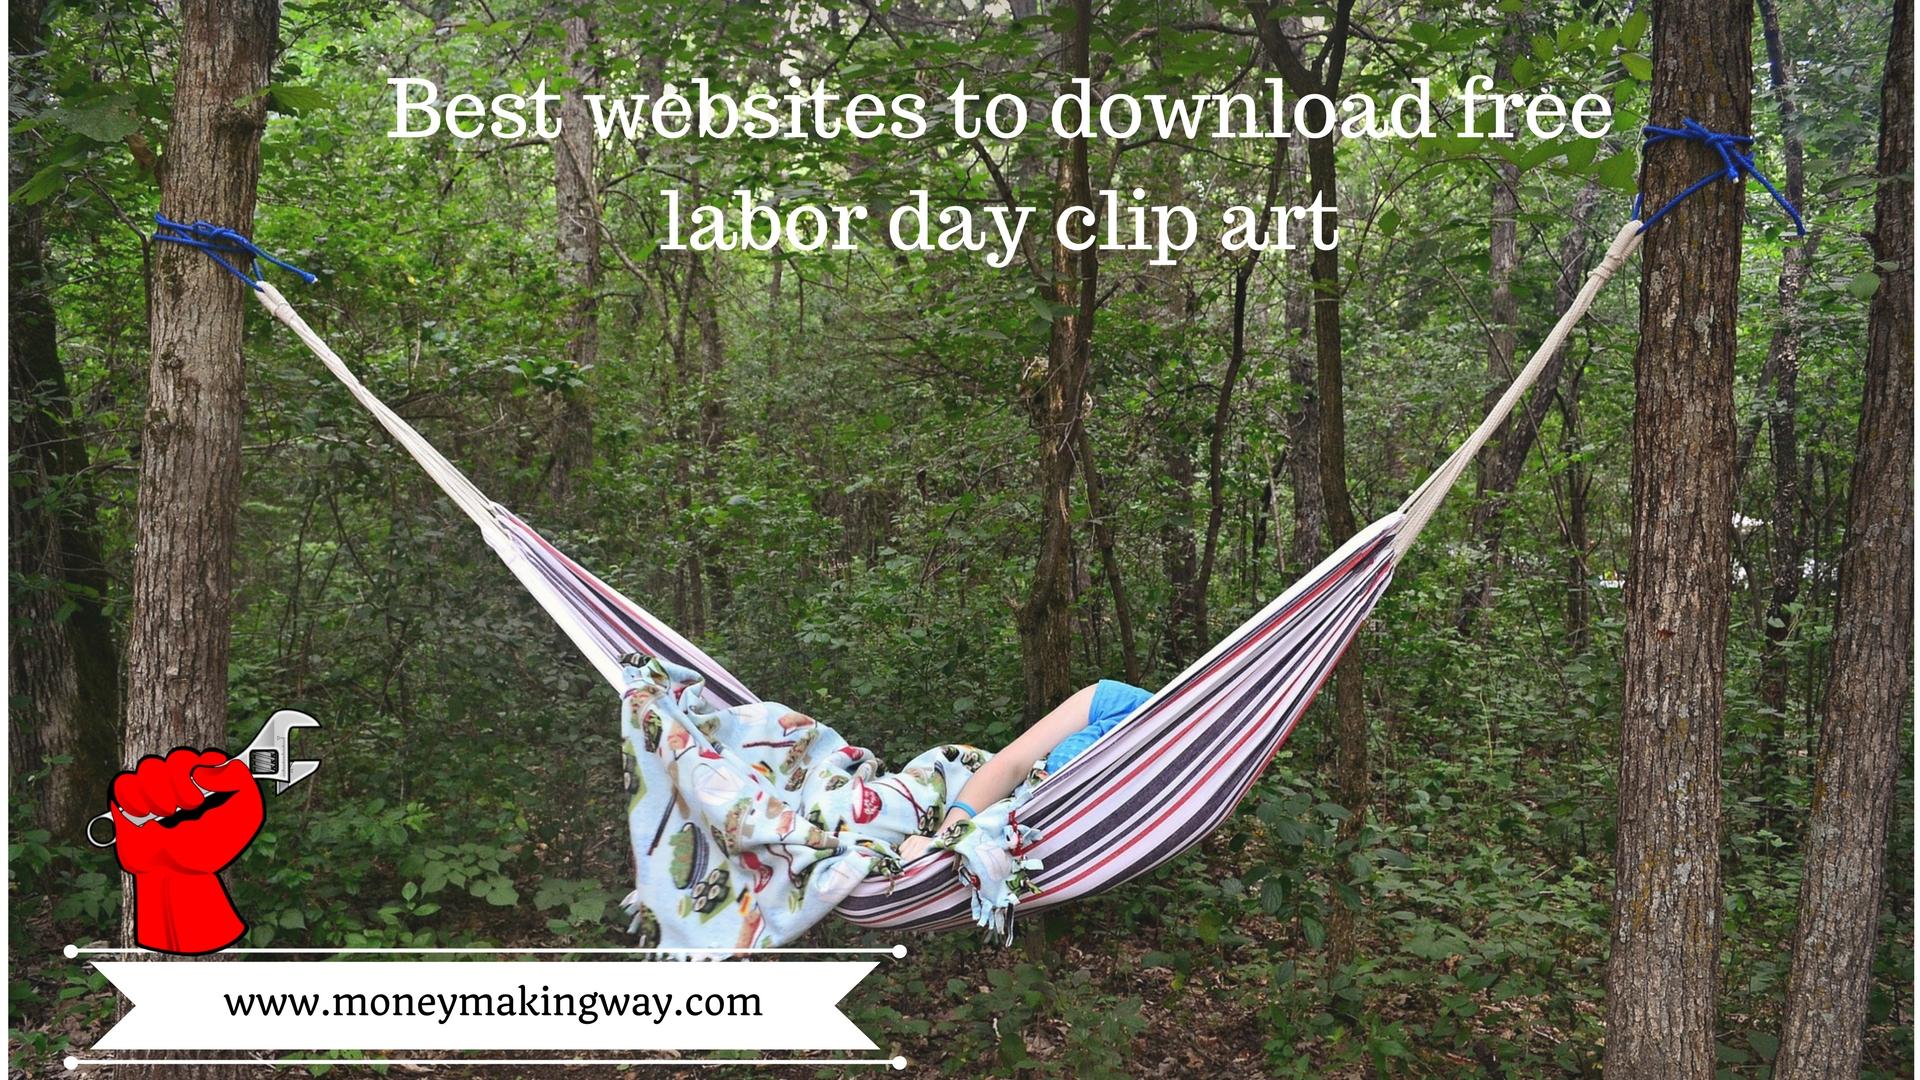 5 Best Websites To Download Free Labor Day Clip Art Sheknowsfinance